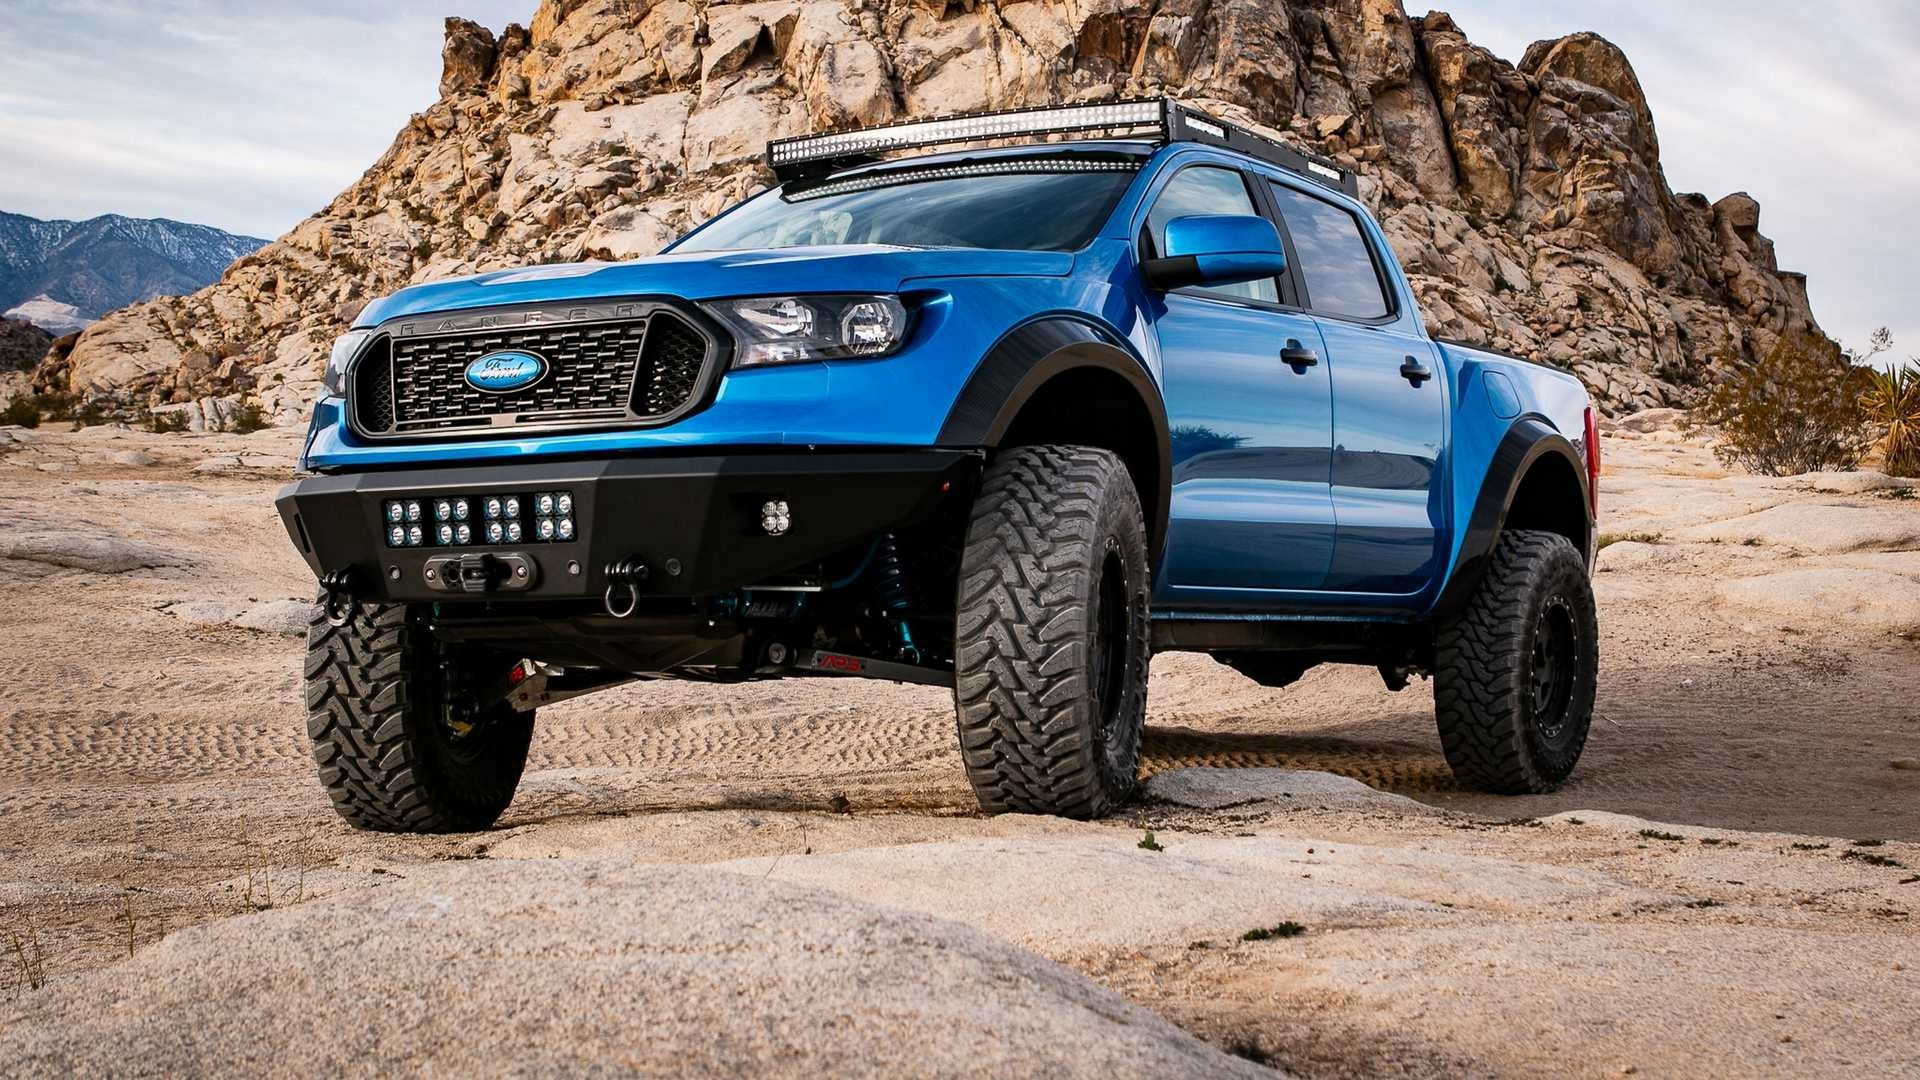 Ford-Ranger-Prorunner-By-APG-7